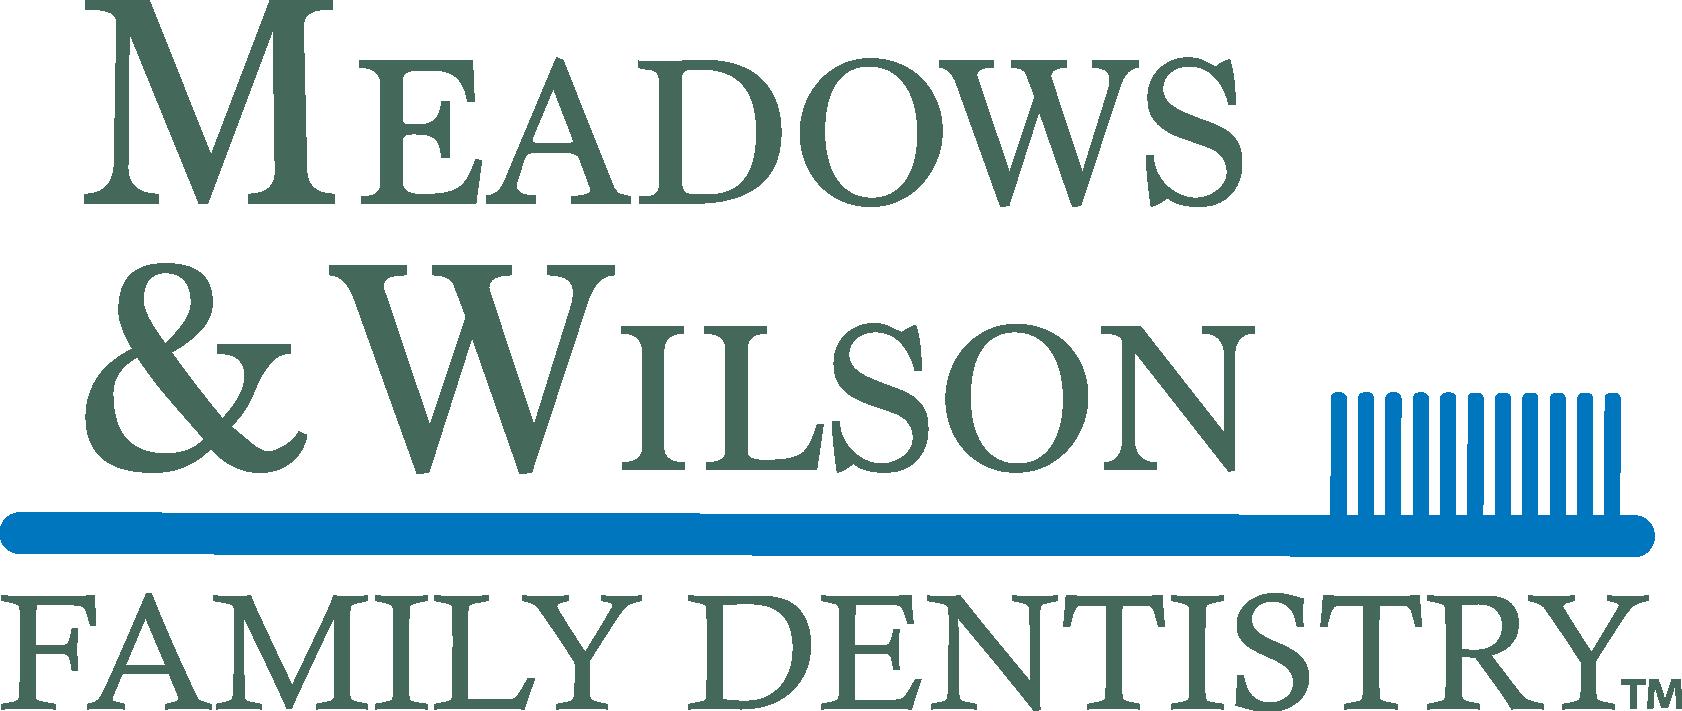 Meadows Wilson Family Dentistry